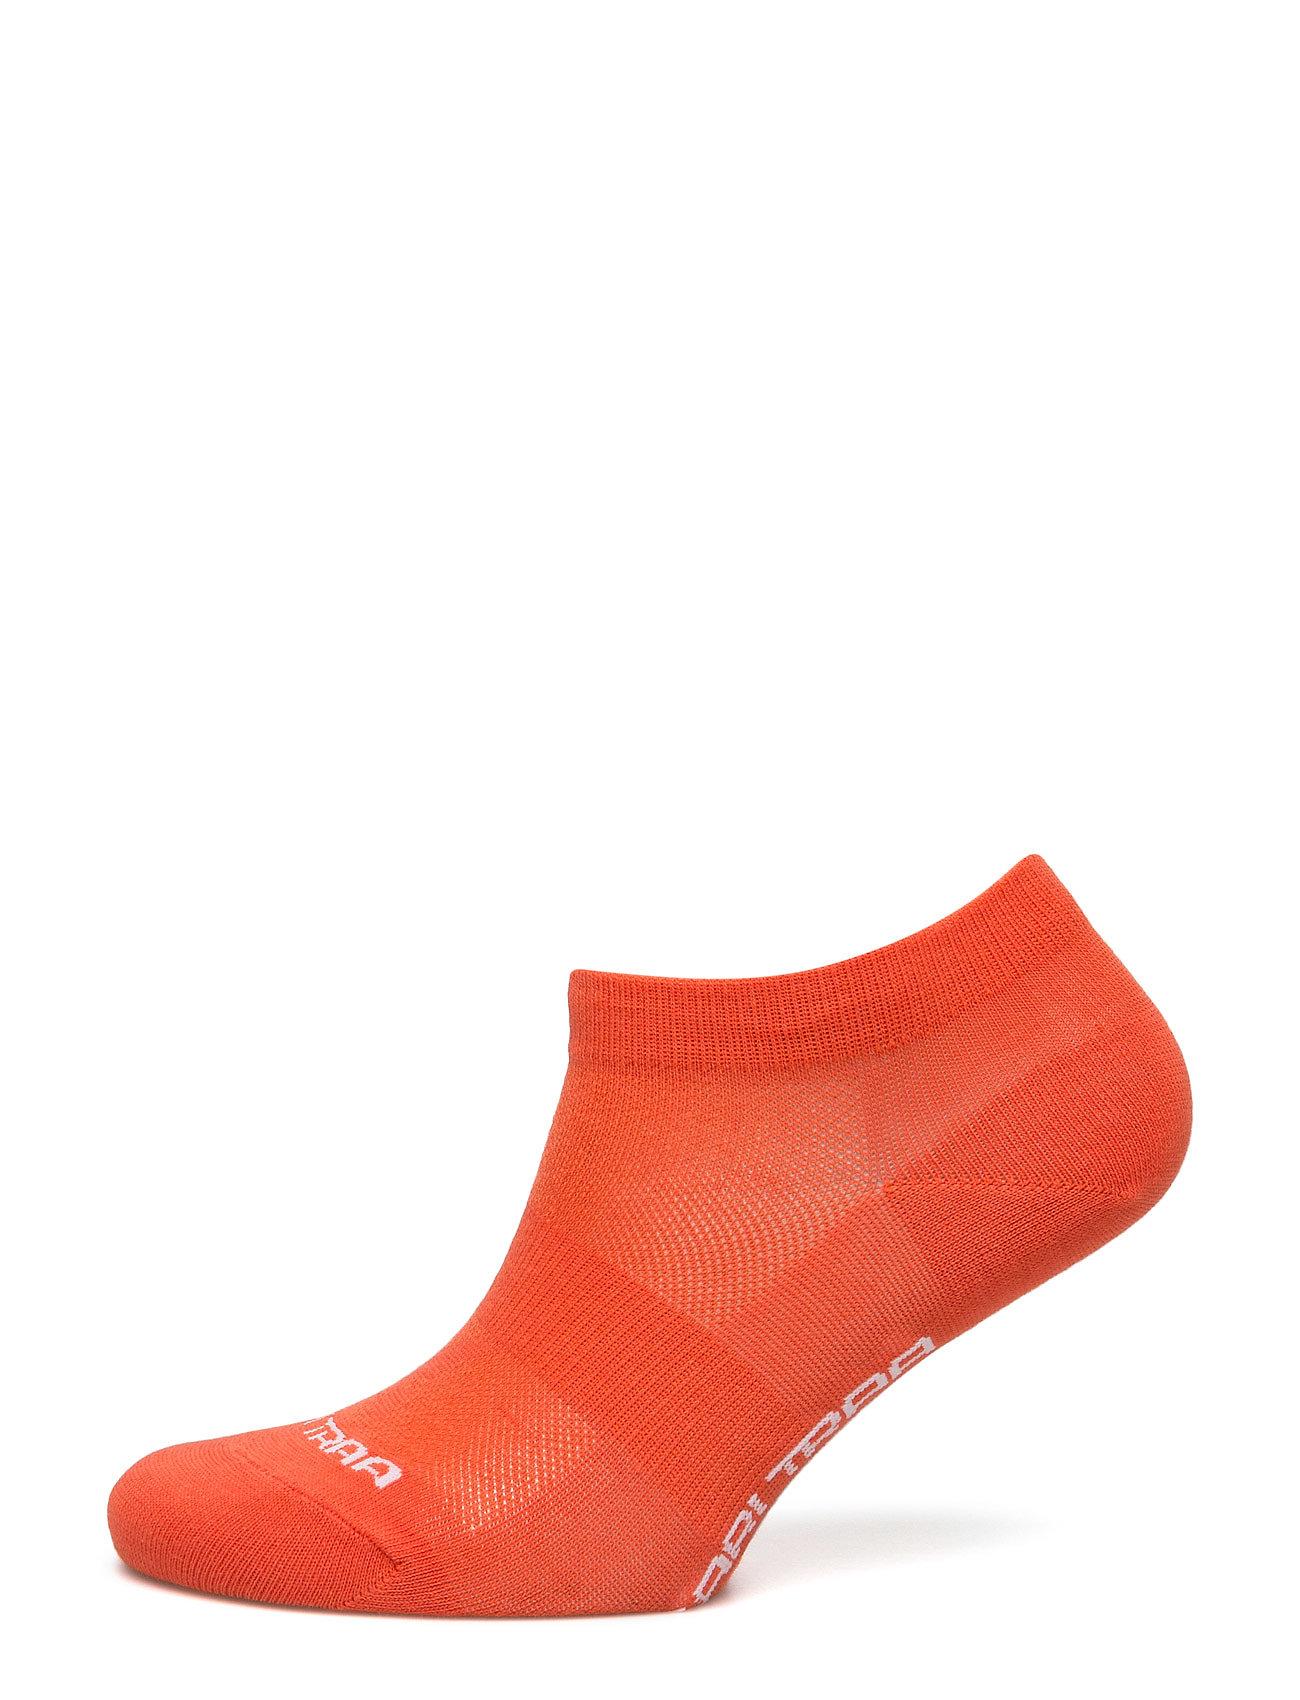 TÌ…Fis Sock Kari Traa Sports undertøj til Kvinder i